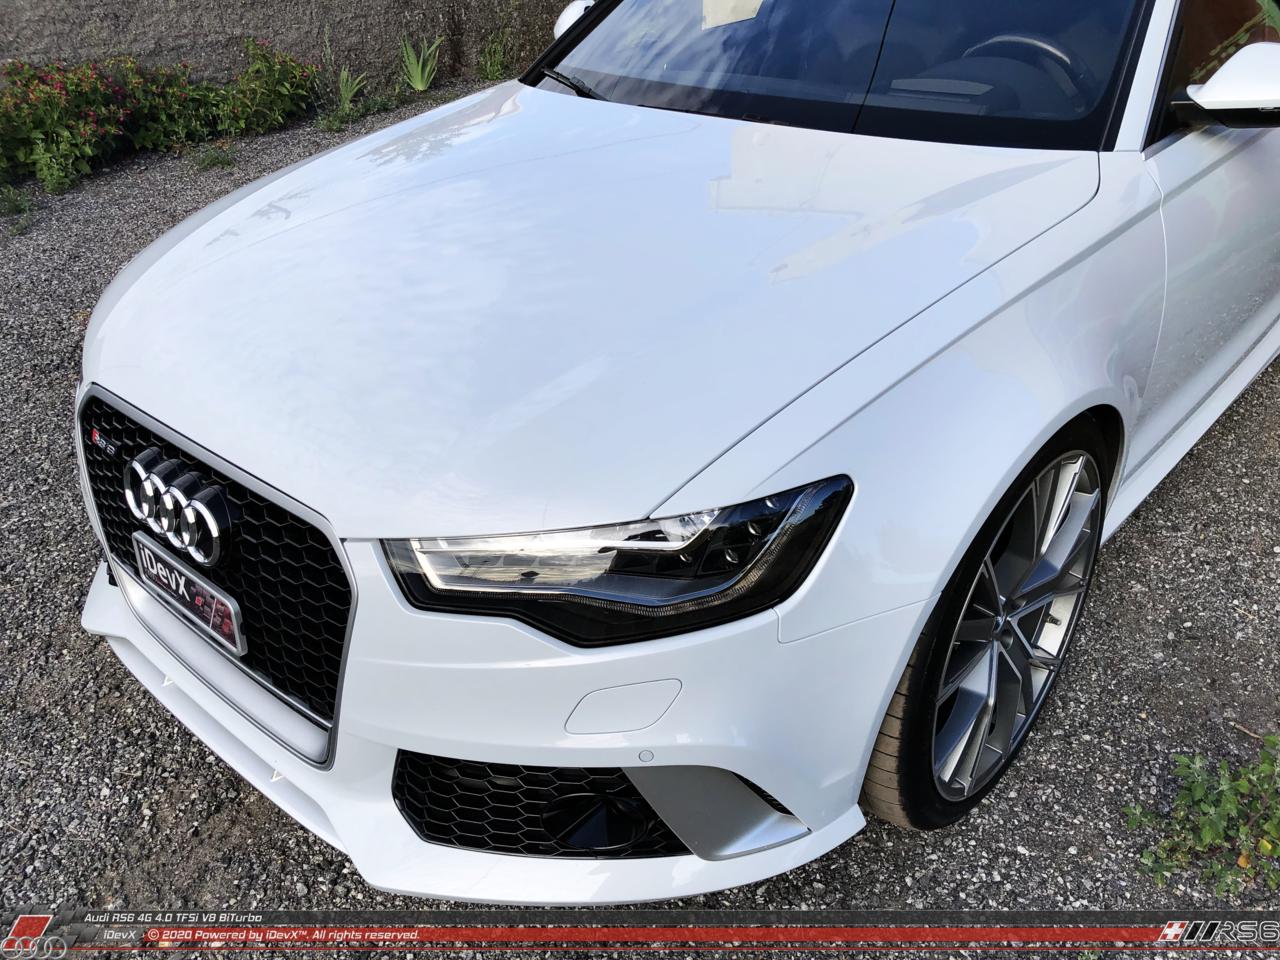 05_08.2019_Audi-RS6_iDevX_038.png